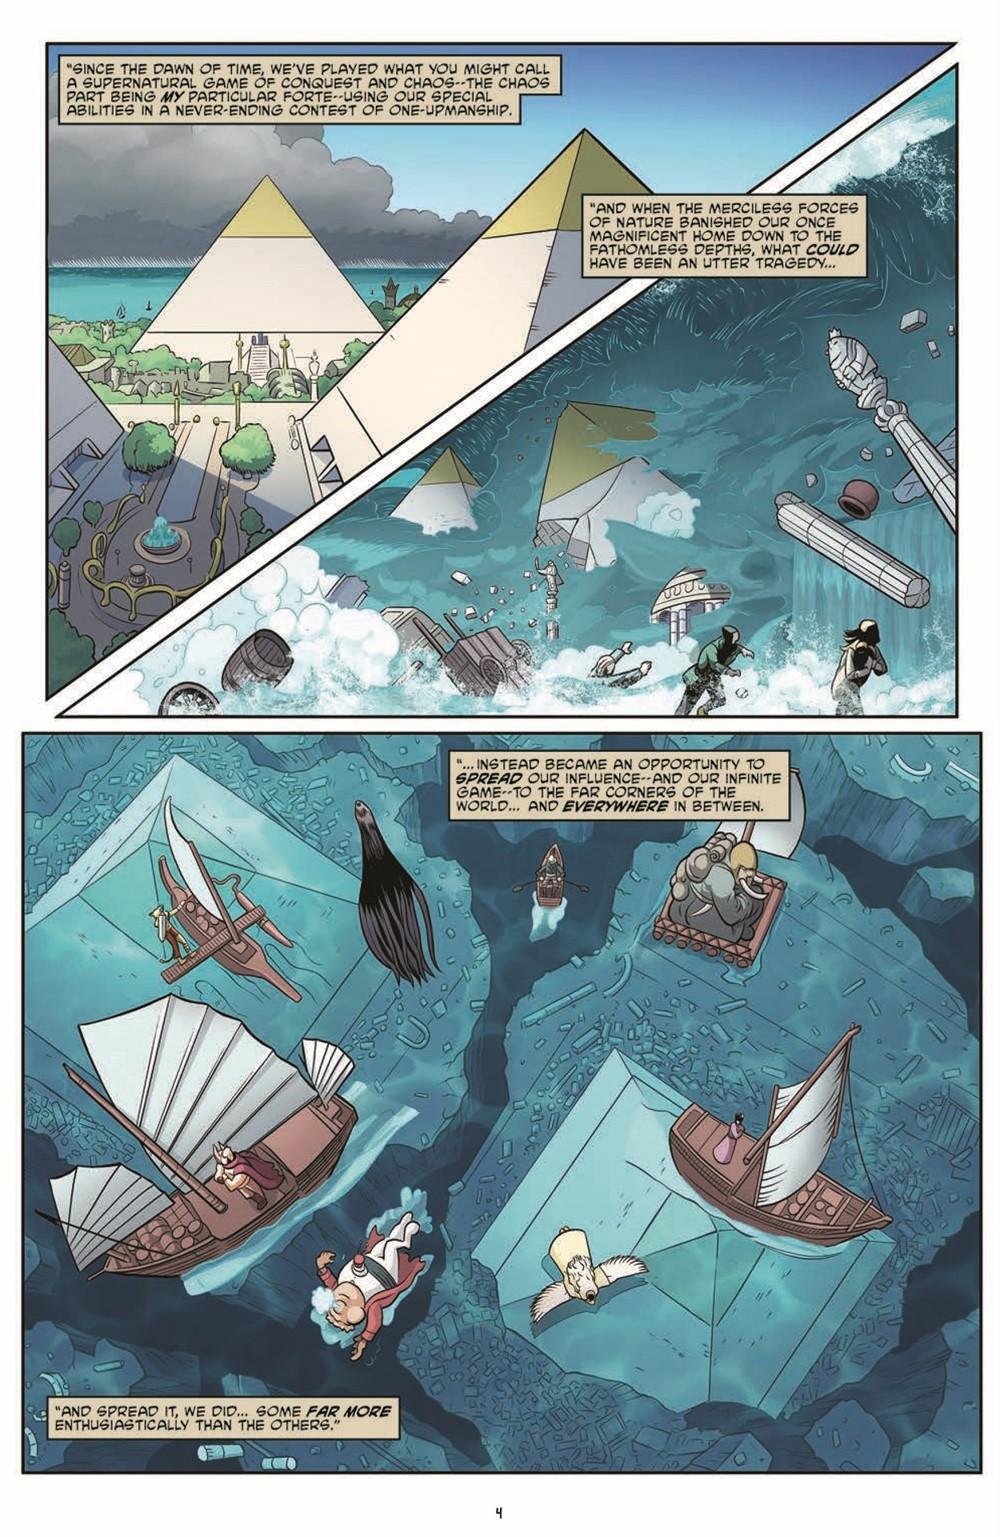 TMNT-Annual2021_pr-6 ComicList Previews: TEENAGE MUTANT NINJA TURTLES ANNUAL 2021